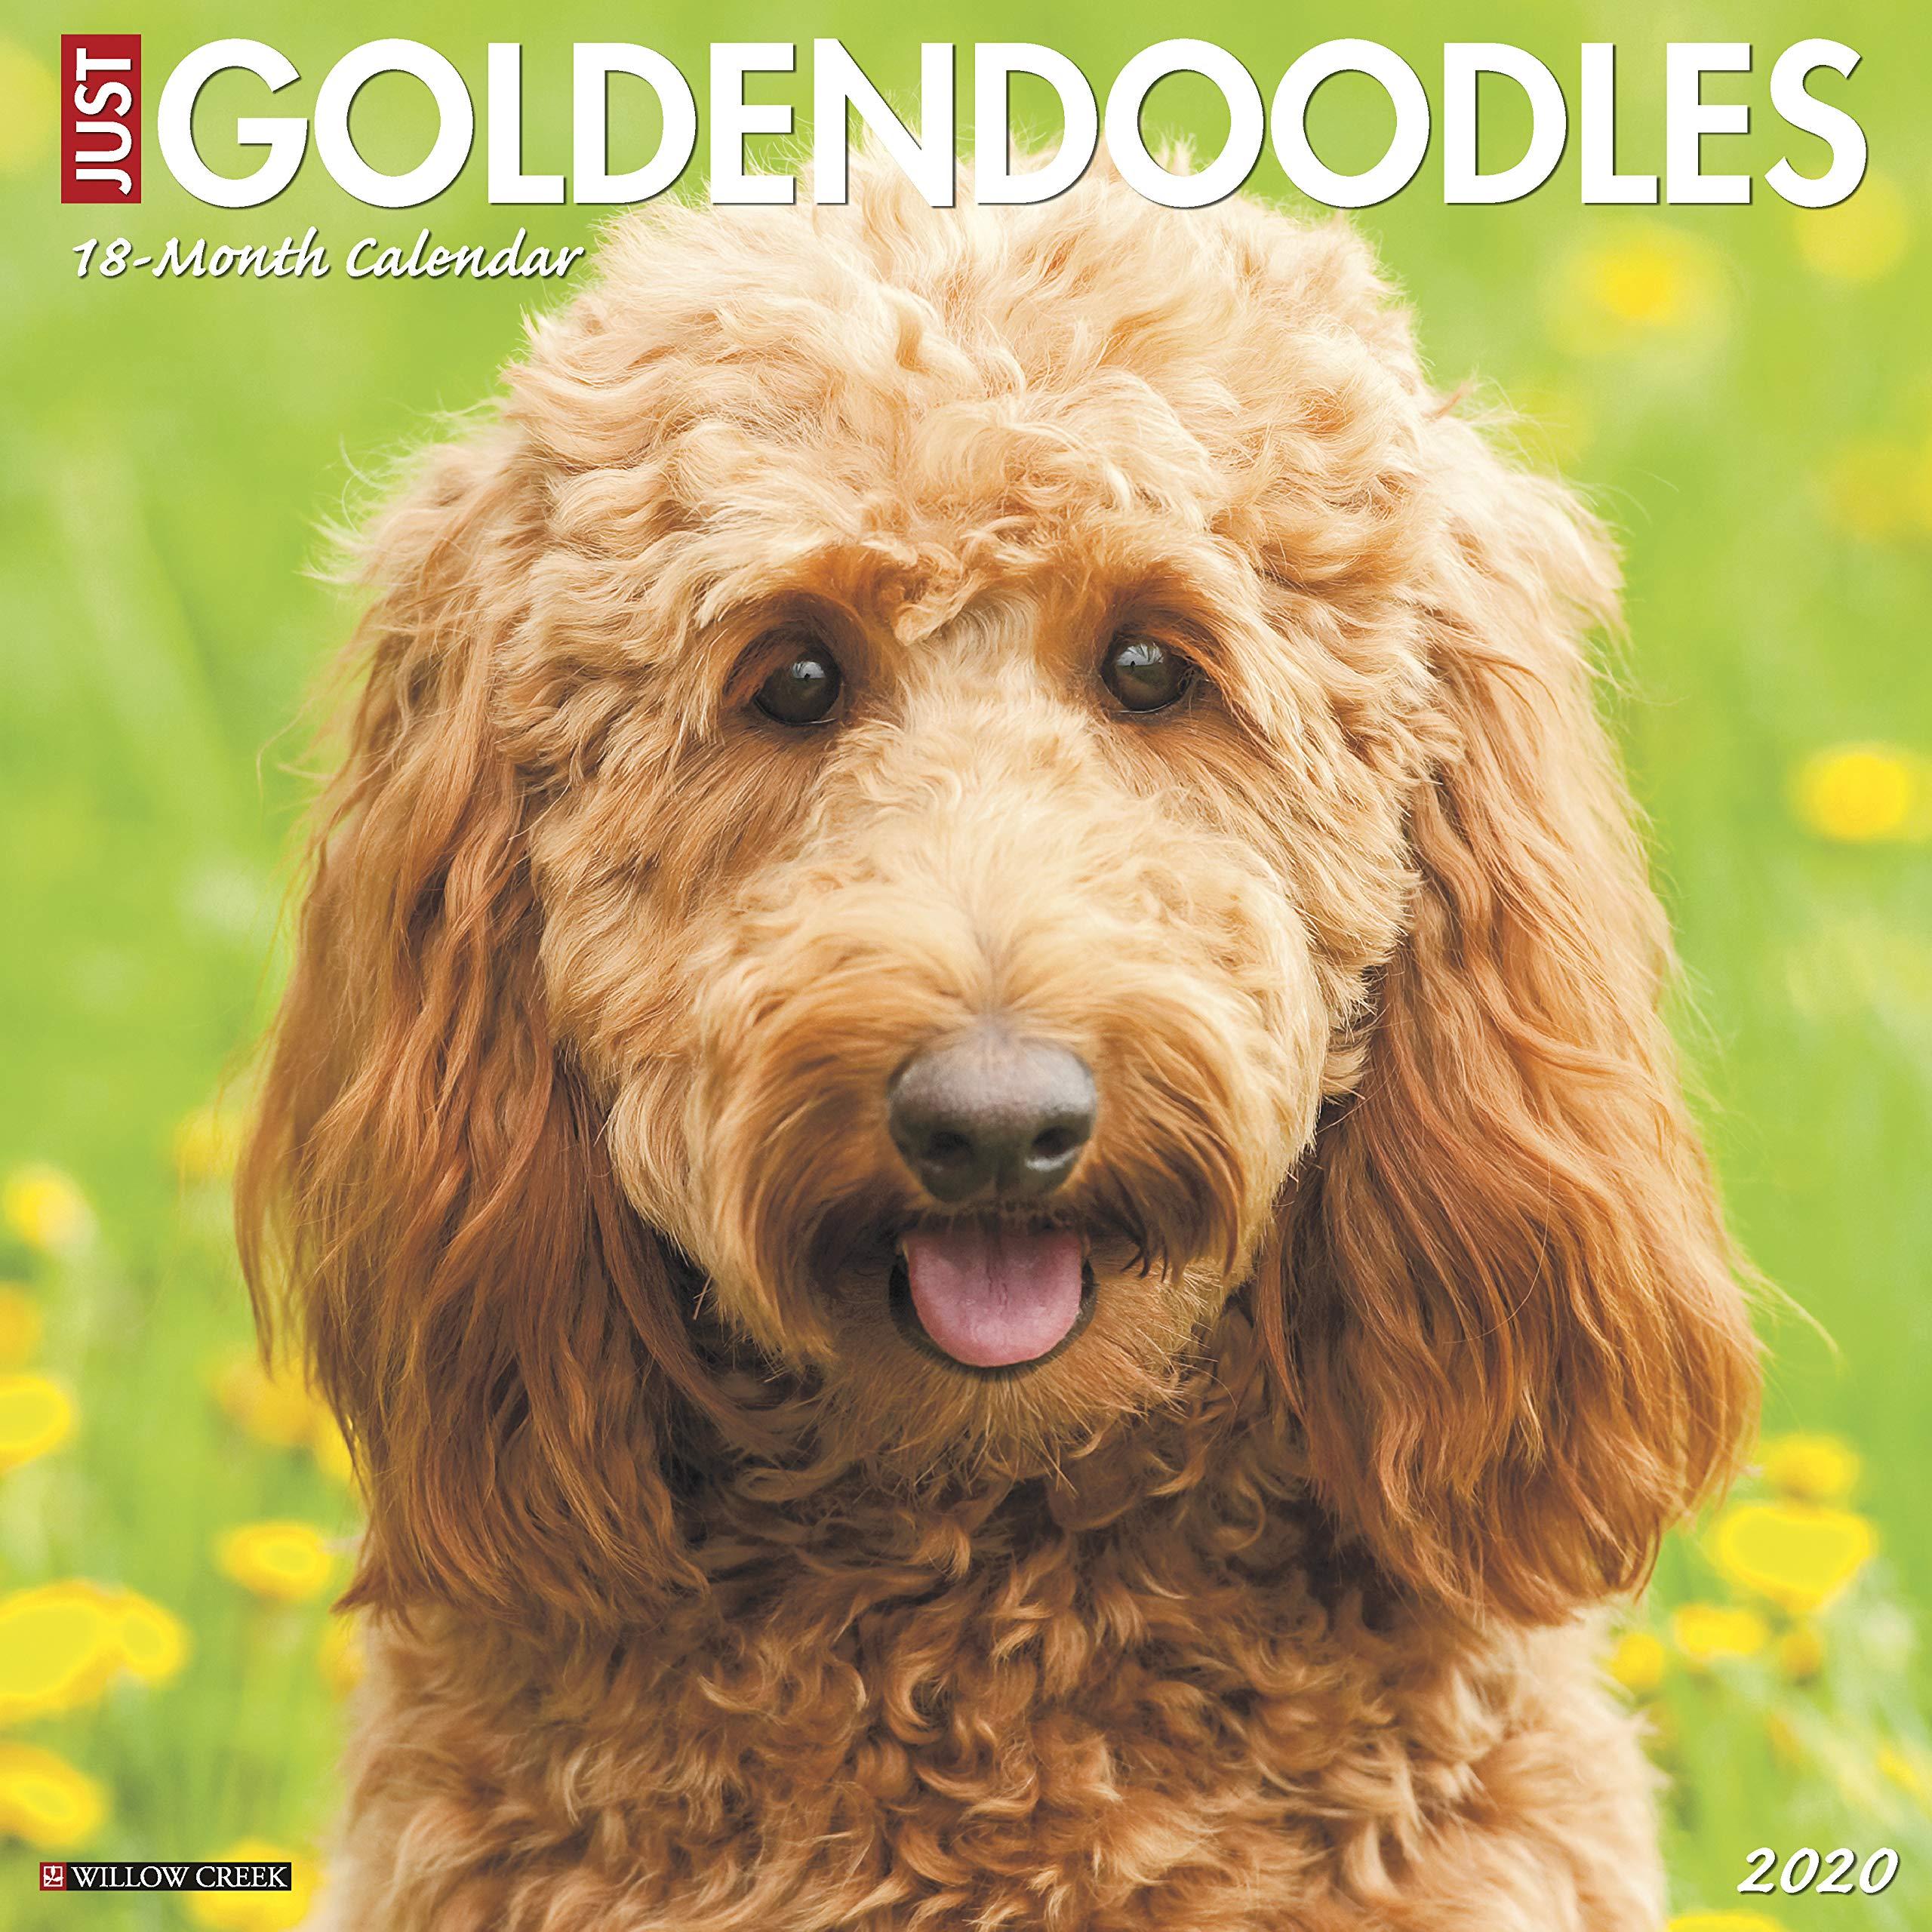 Just Goldendoodles 2020 Wall Calendar (Dog Breed Calendar